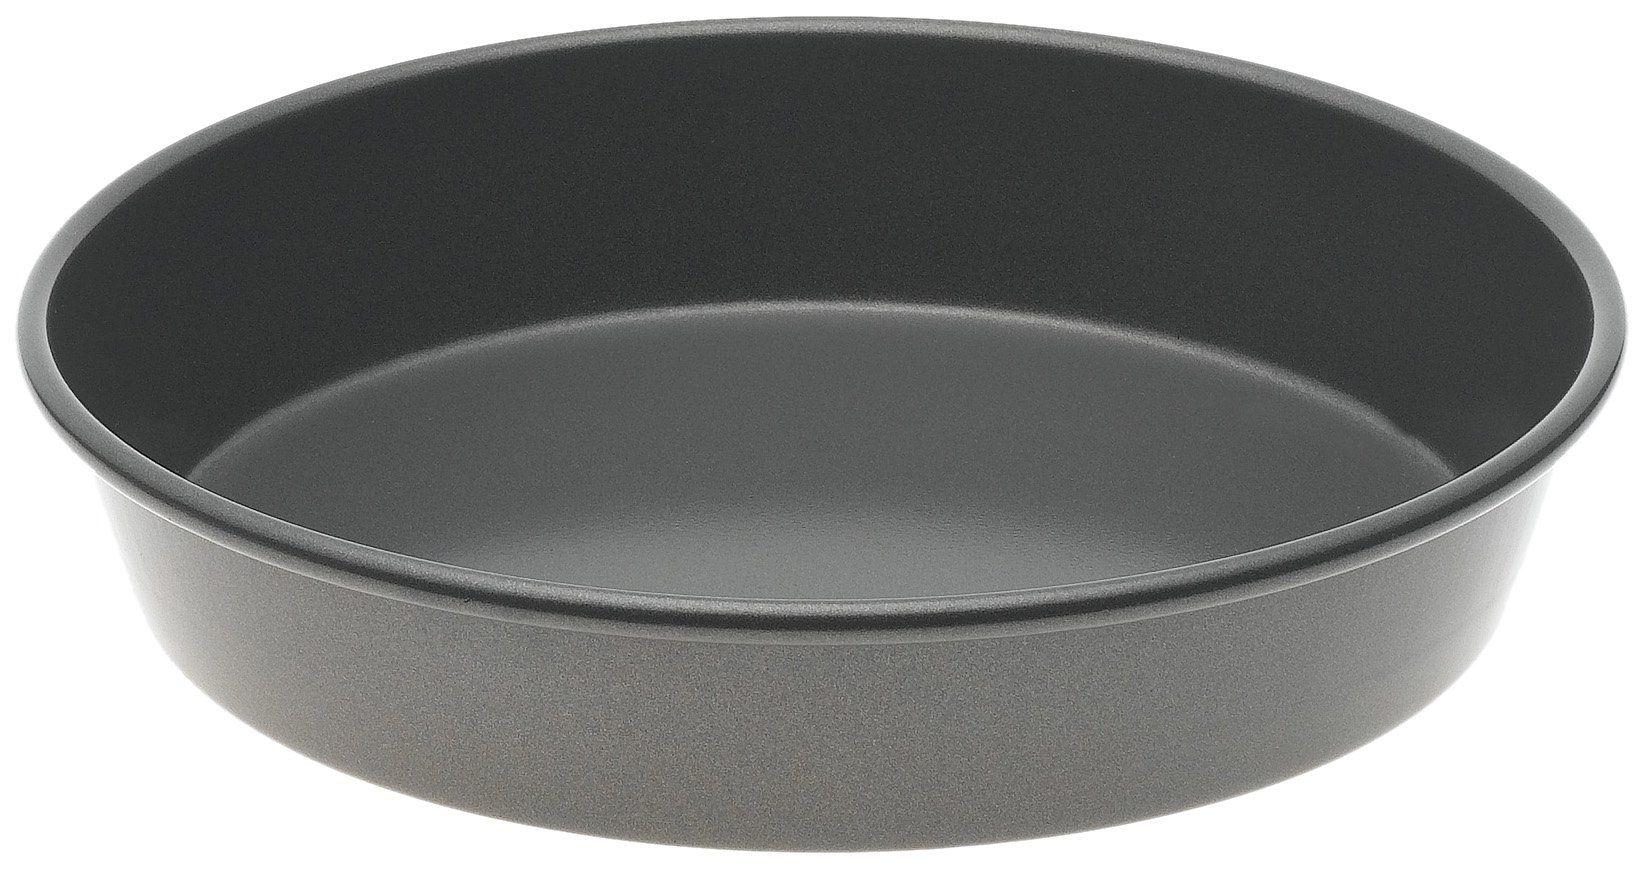 Baking Sheet Clipart Google Search Round Cake Pans